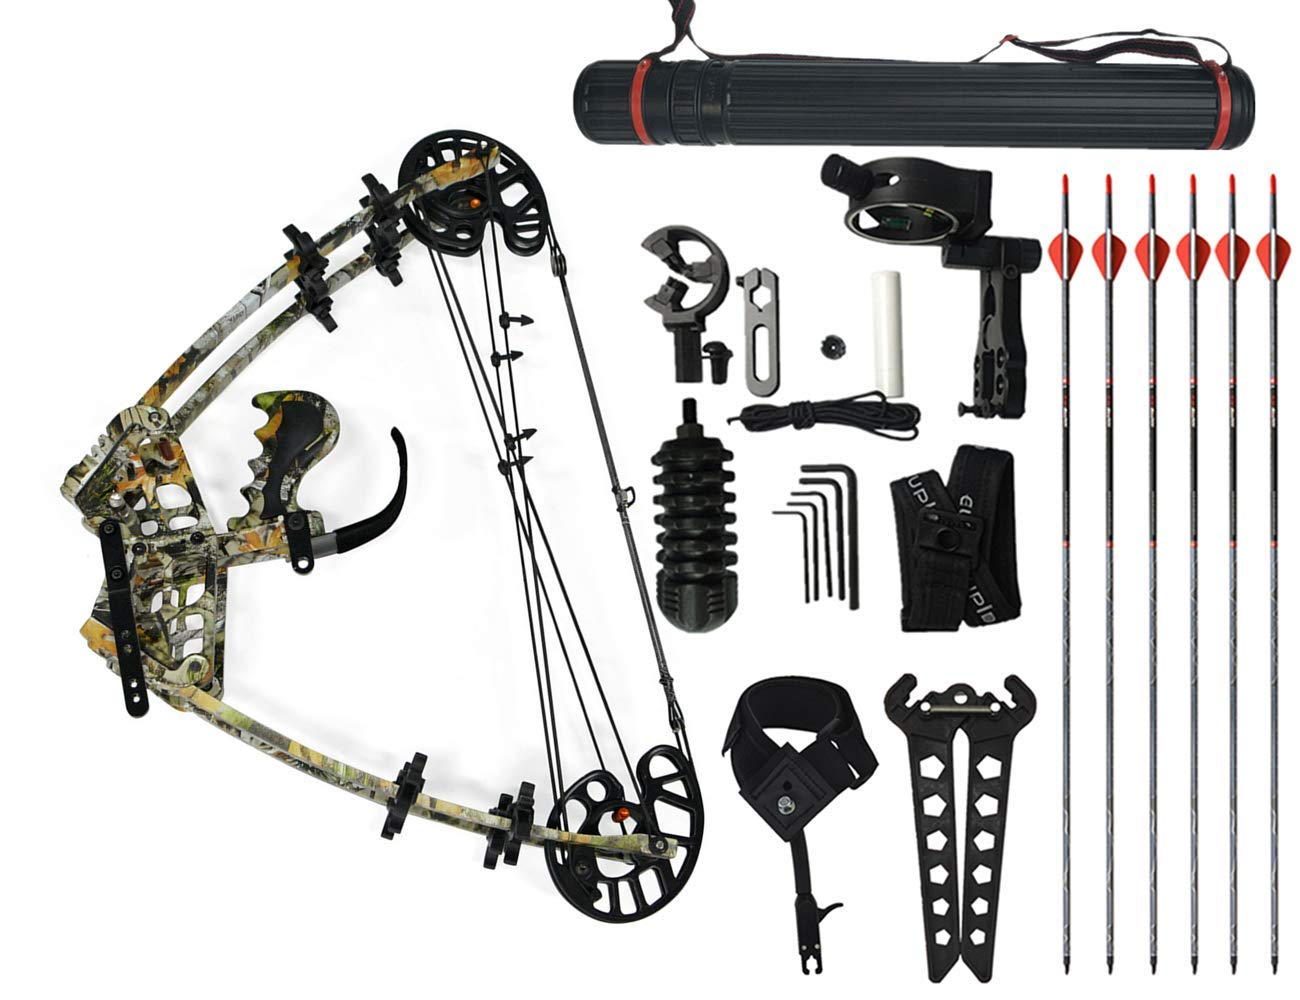 MILAEM 45lbs 複合弓 矢と鋼球を使える多目的コンパウンドボウ アルミニウム製スチールボール弓 左/右利き 節約力の割合:75%~80% アーチェリー狩猟弓 撮影魚弓 弓道練習専用弓 迷彩セット